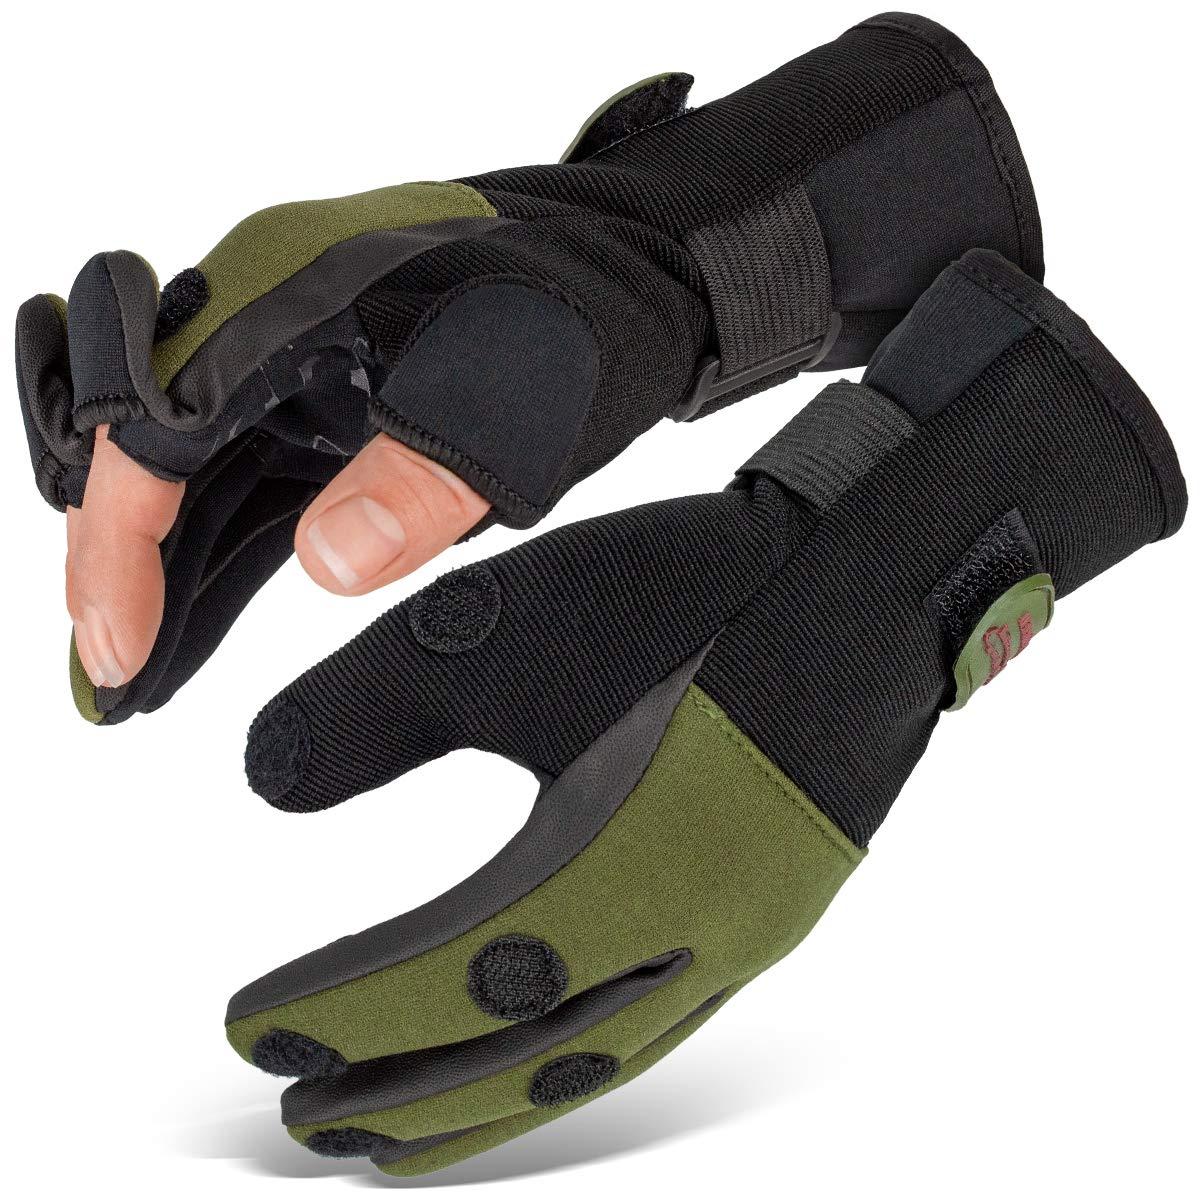 Angel Handschuhe Fishing Gloves Neopren Angelhandschuhe Wizard